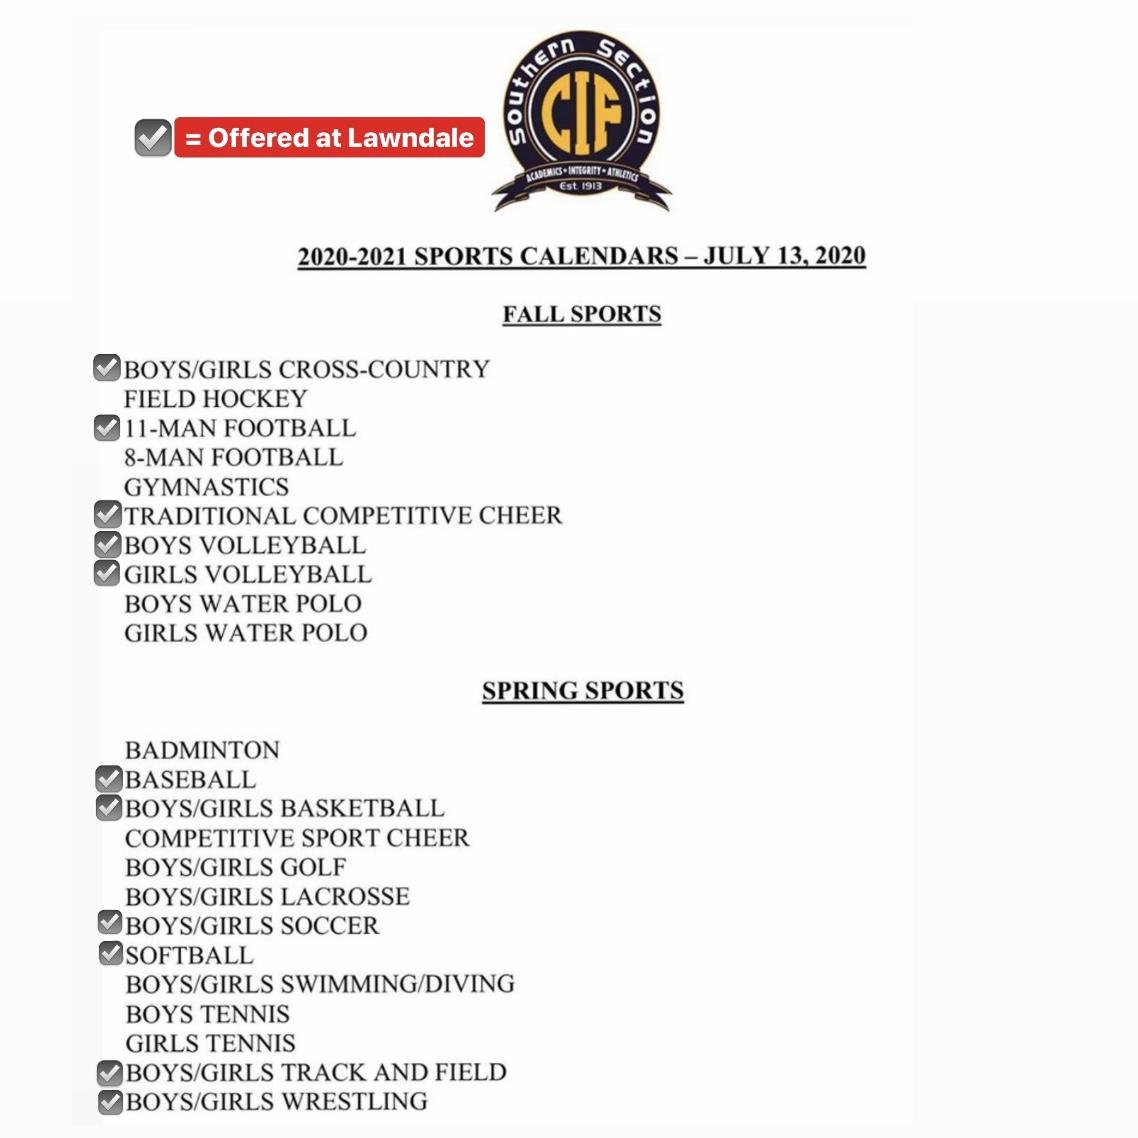 IMPORTANT UPDATE: CIF Sports Calendar